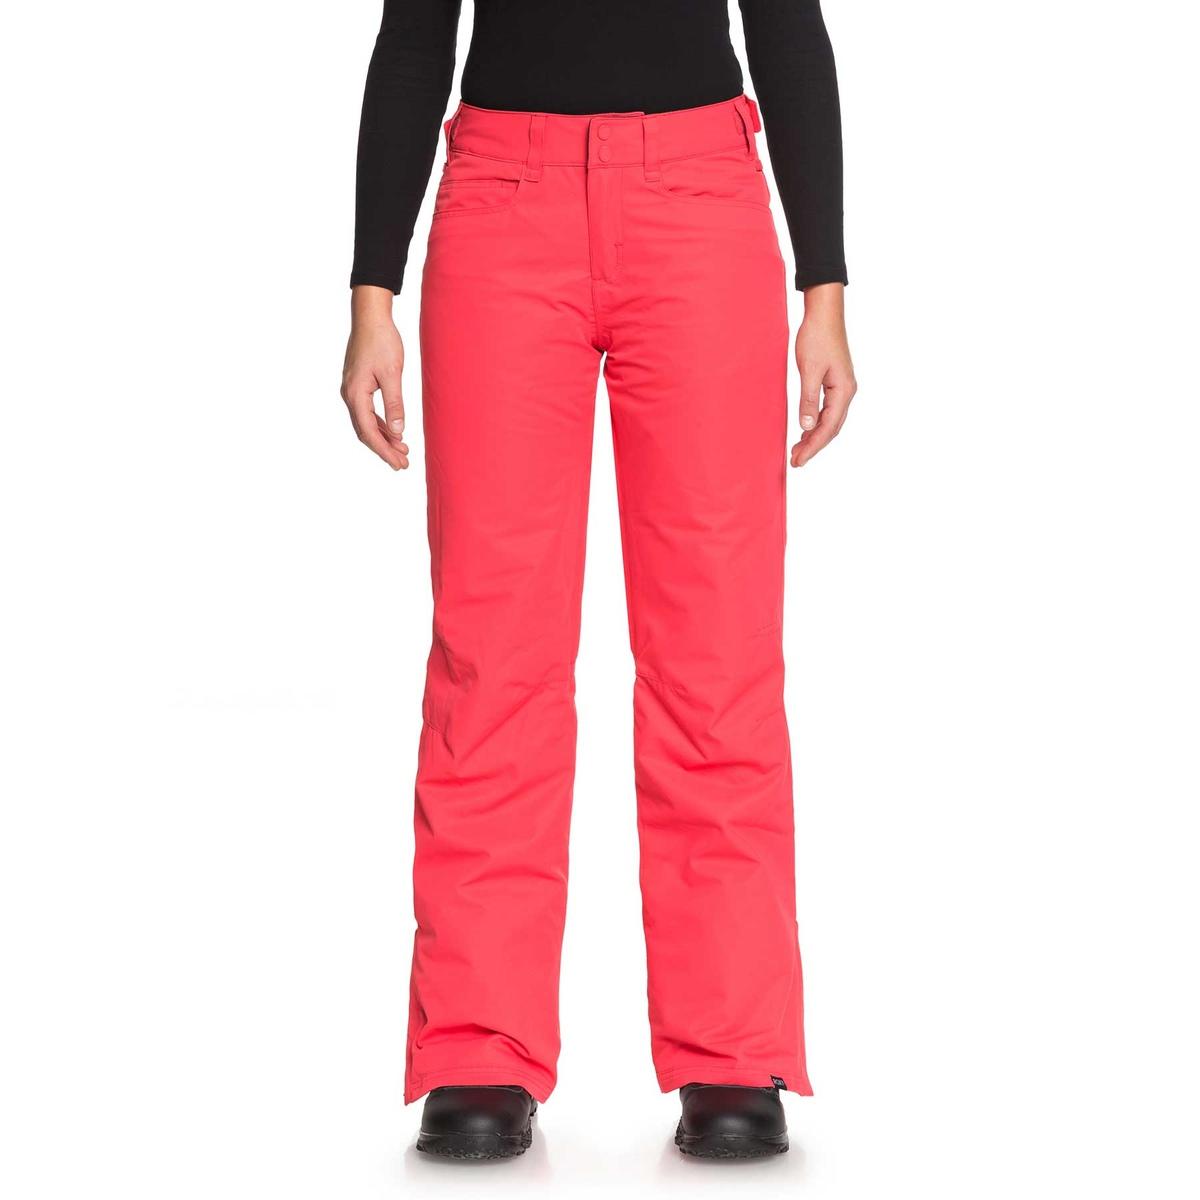 Prezzi Roxy pantaloni backyard donna